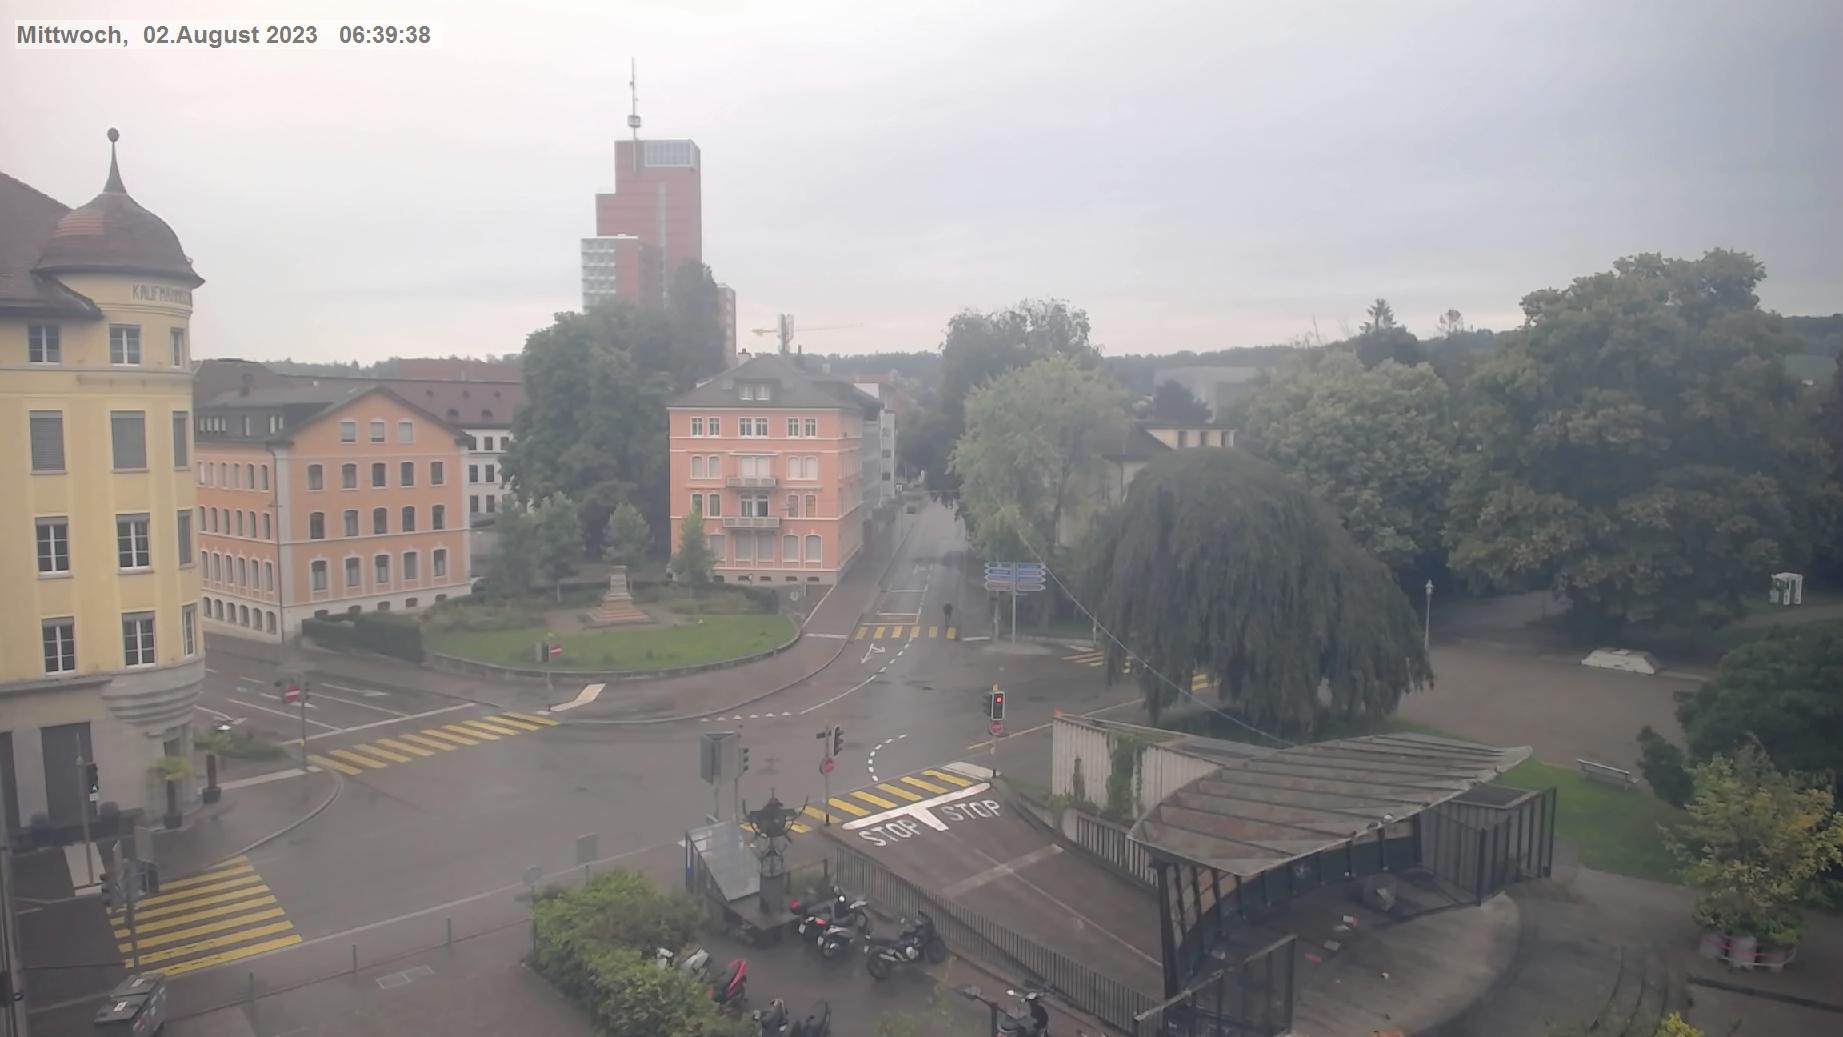 Webcam: Zurigo, Svizzera